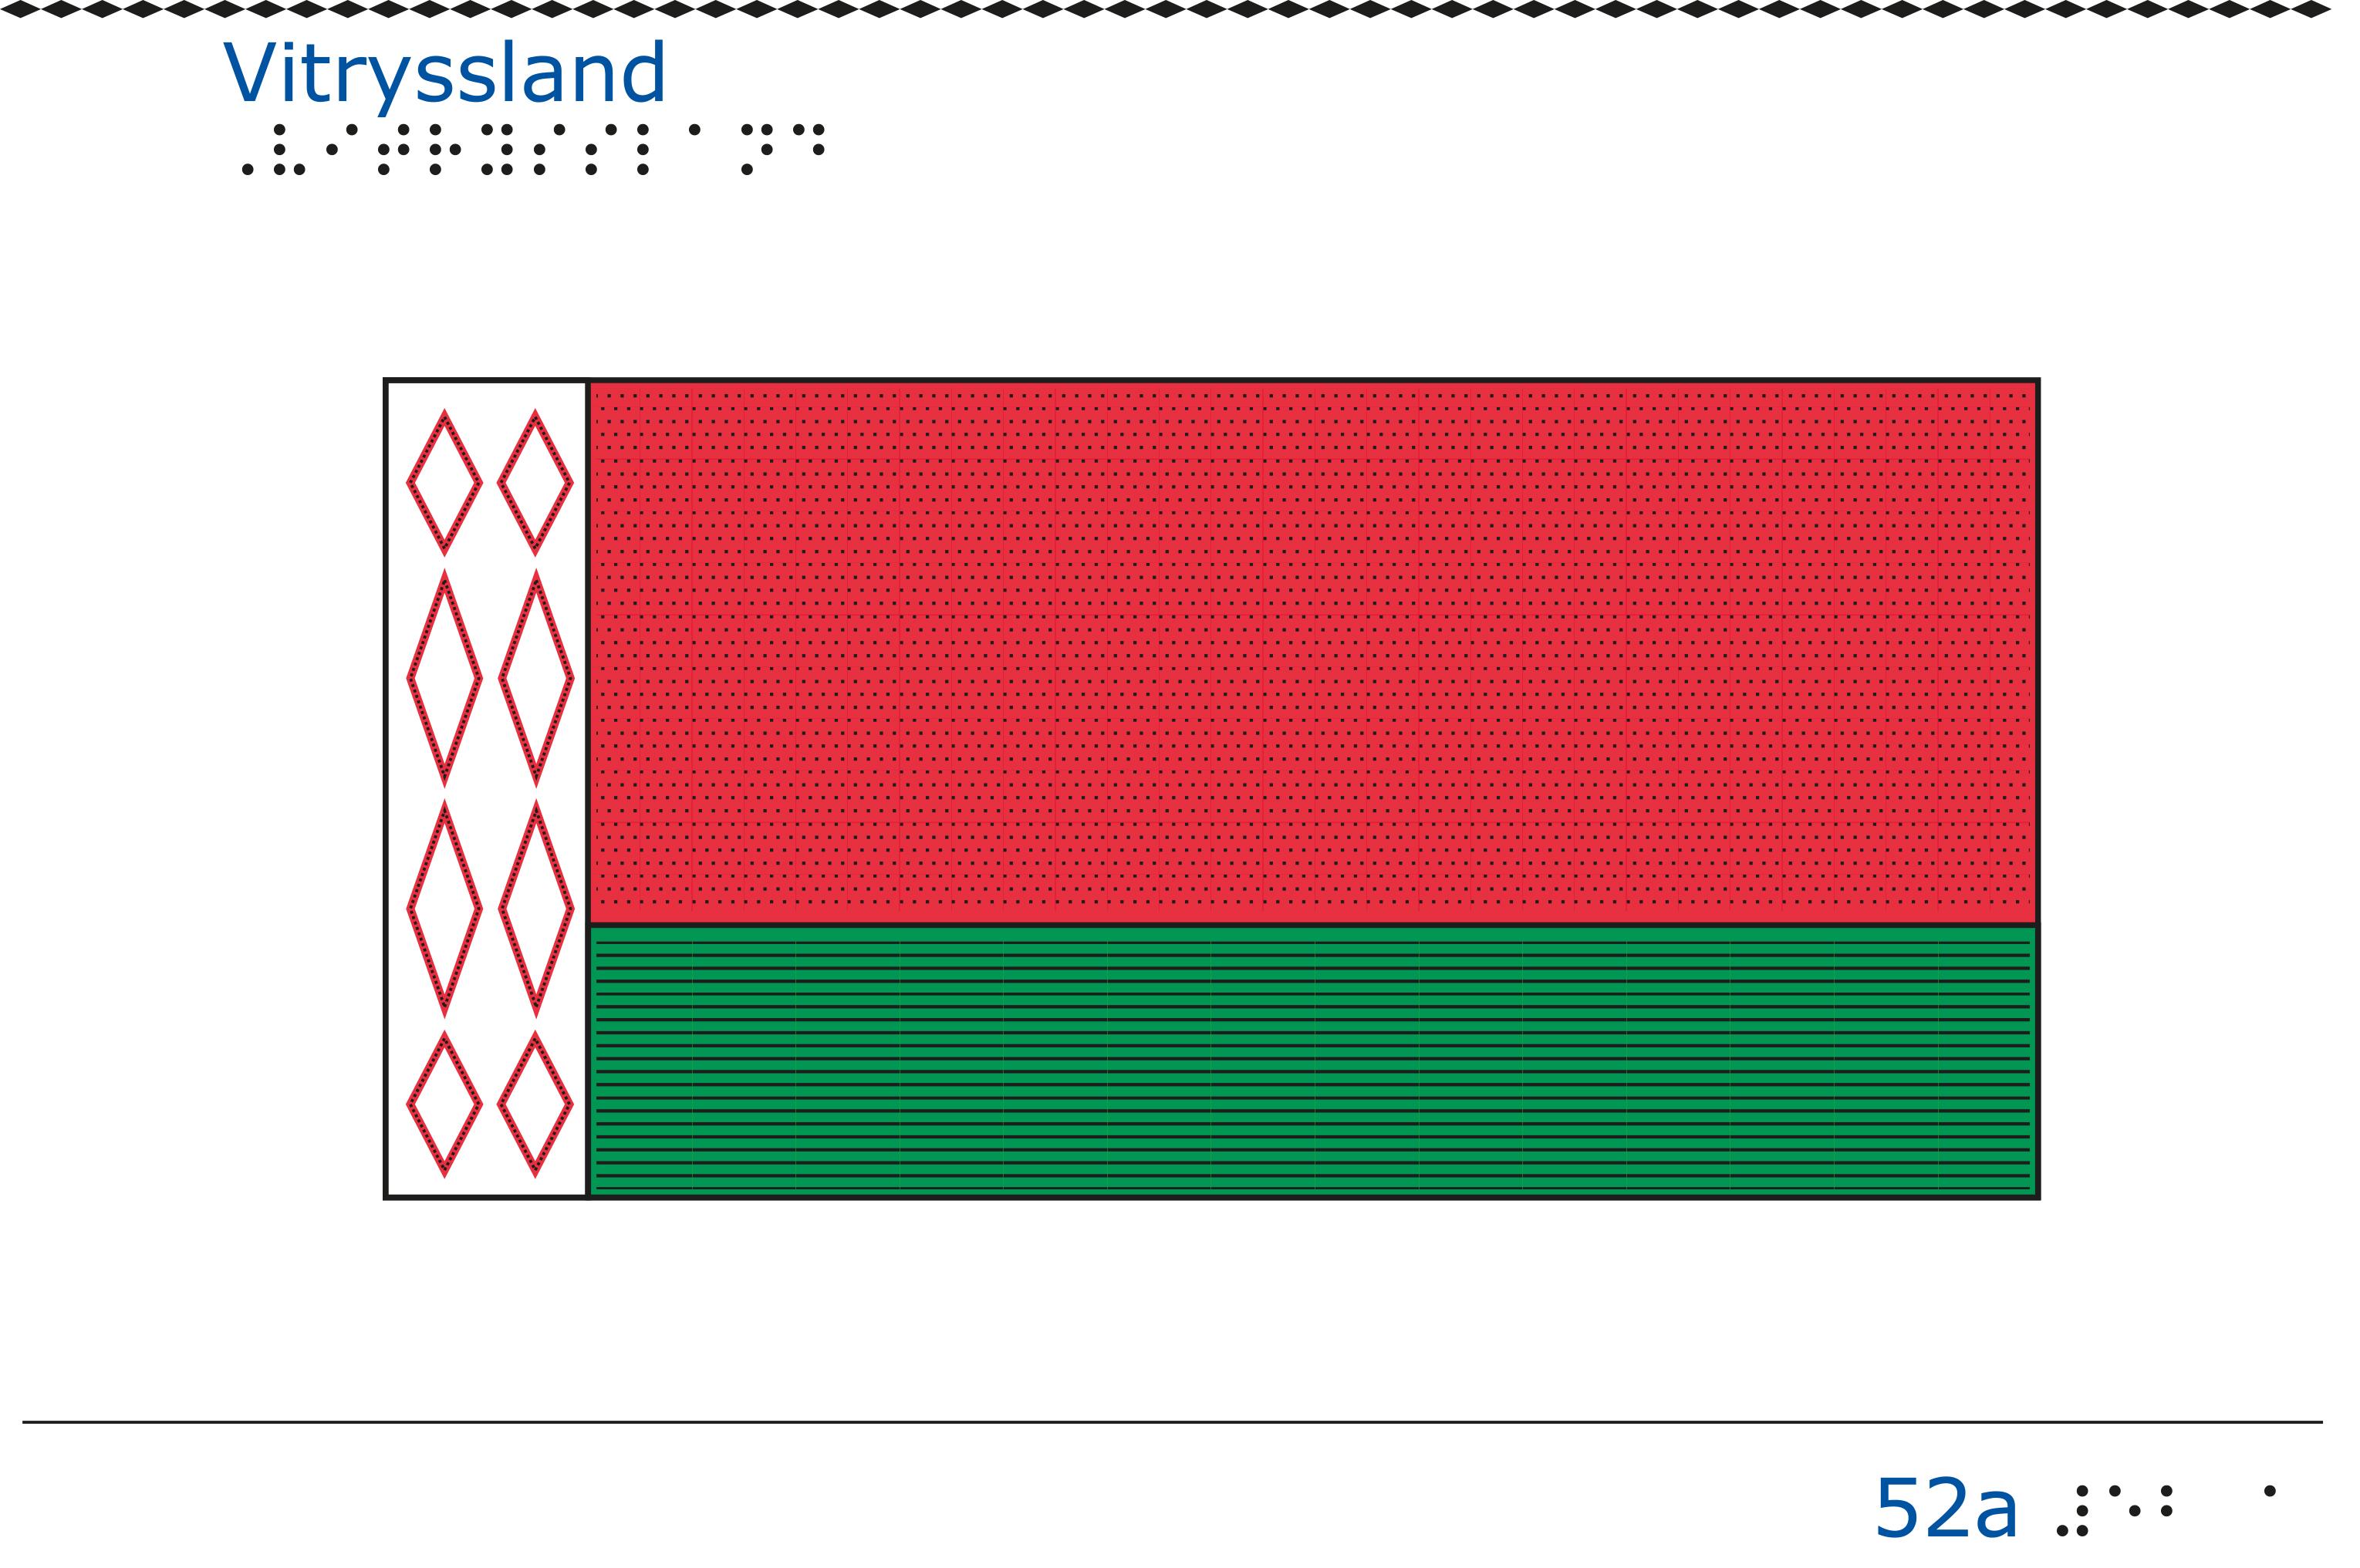 Taktil bild Vitrysslands flagga.